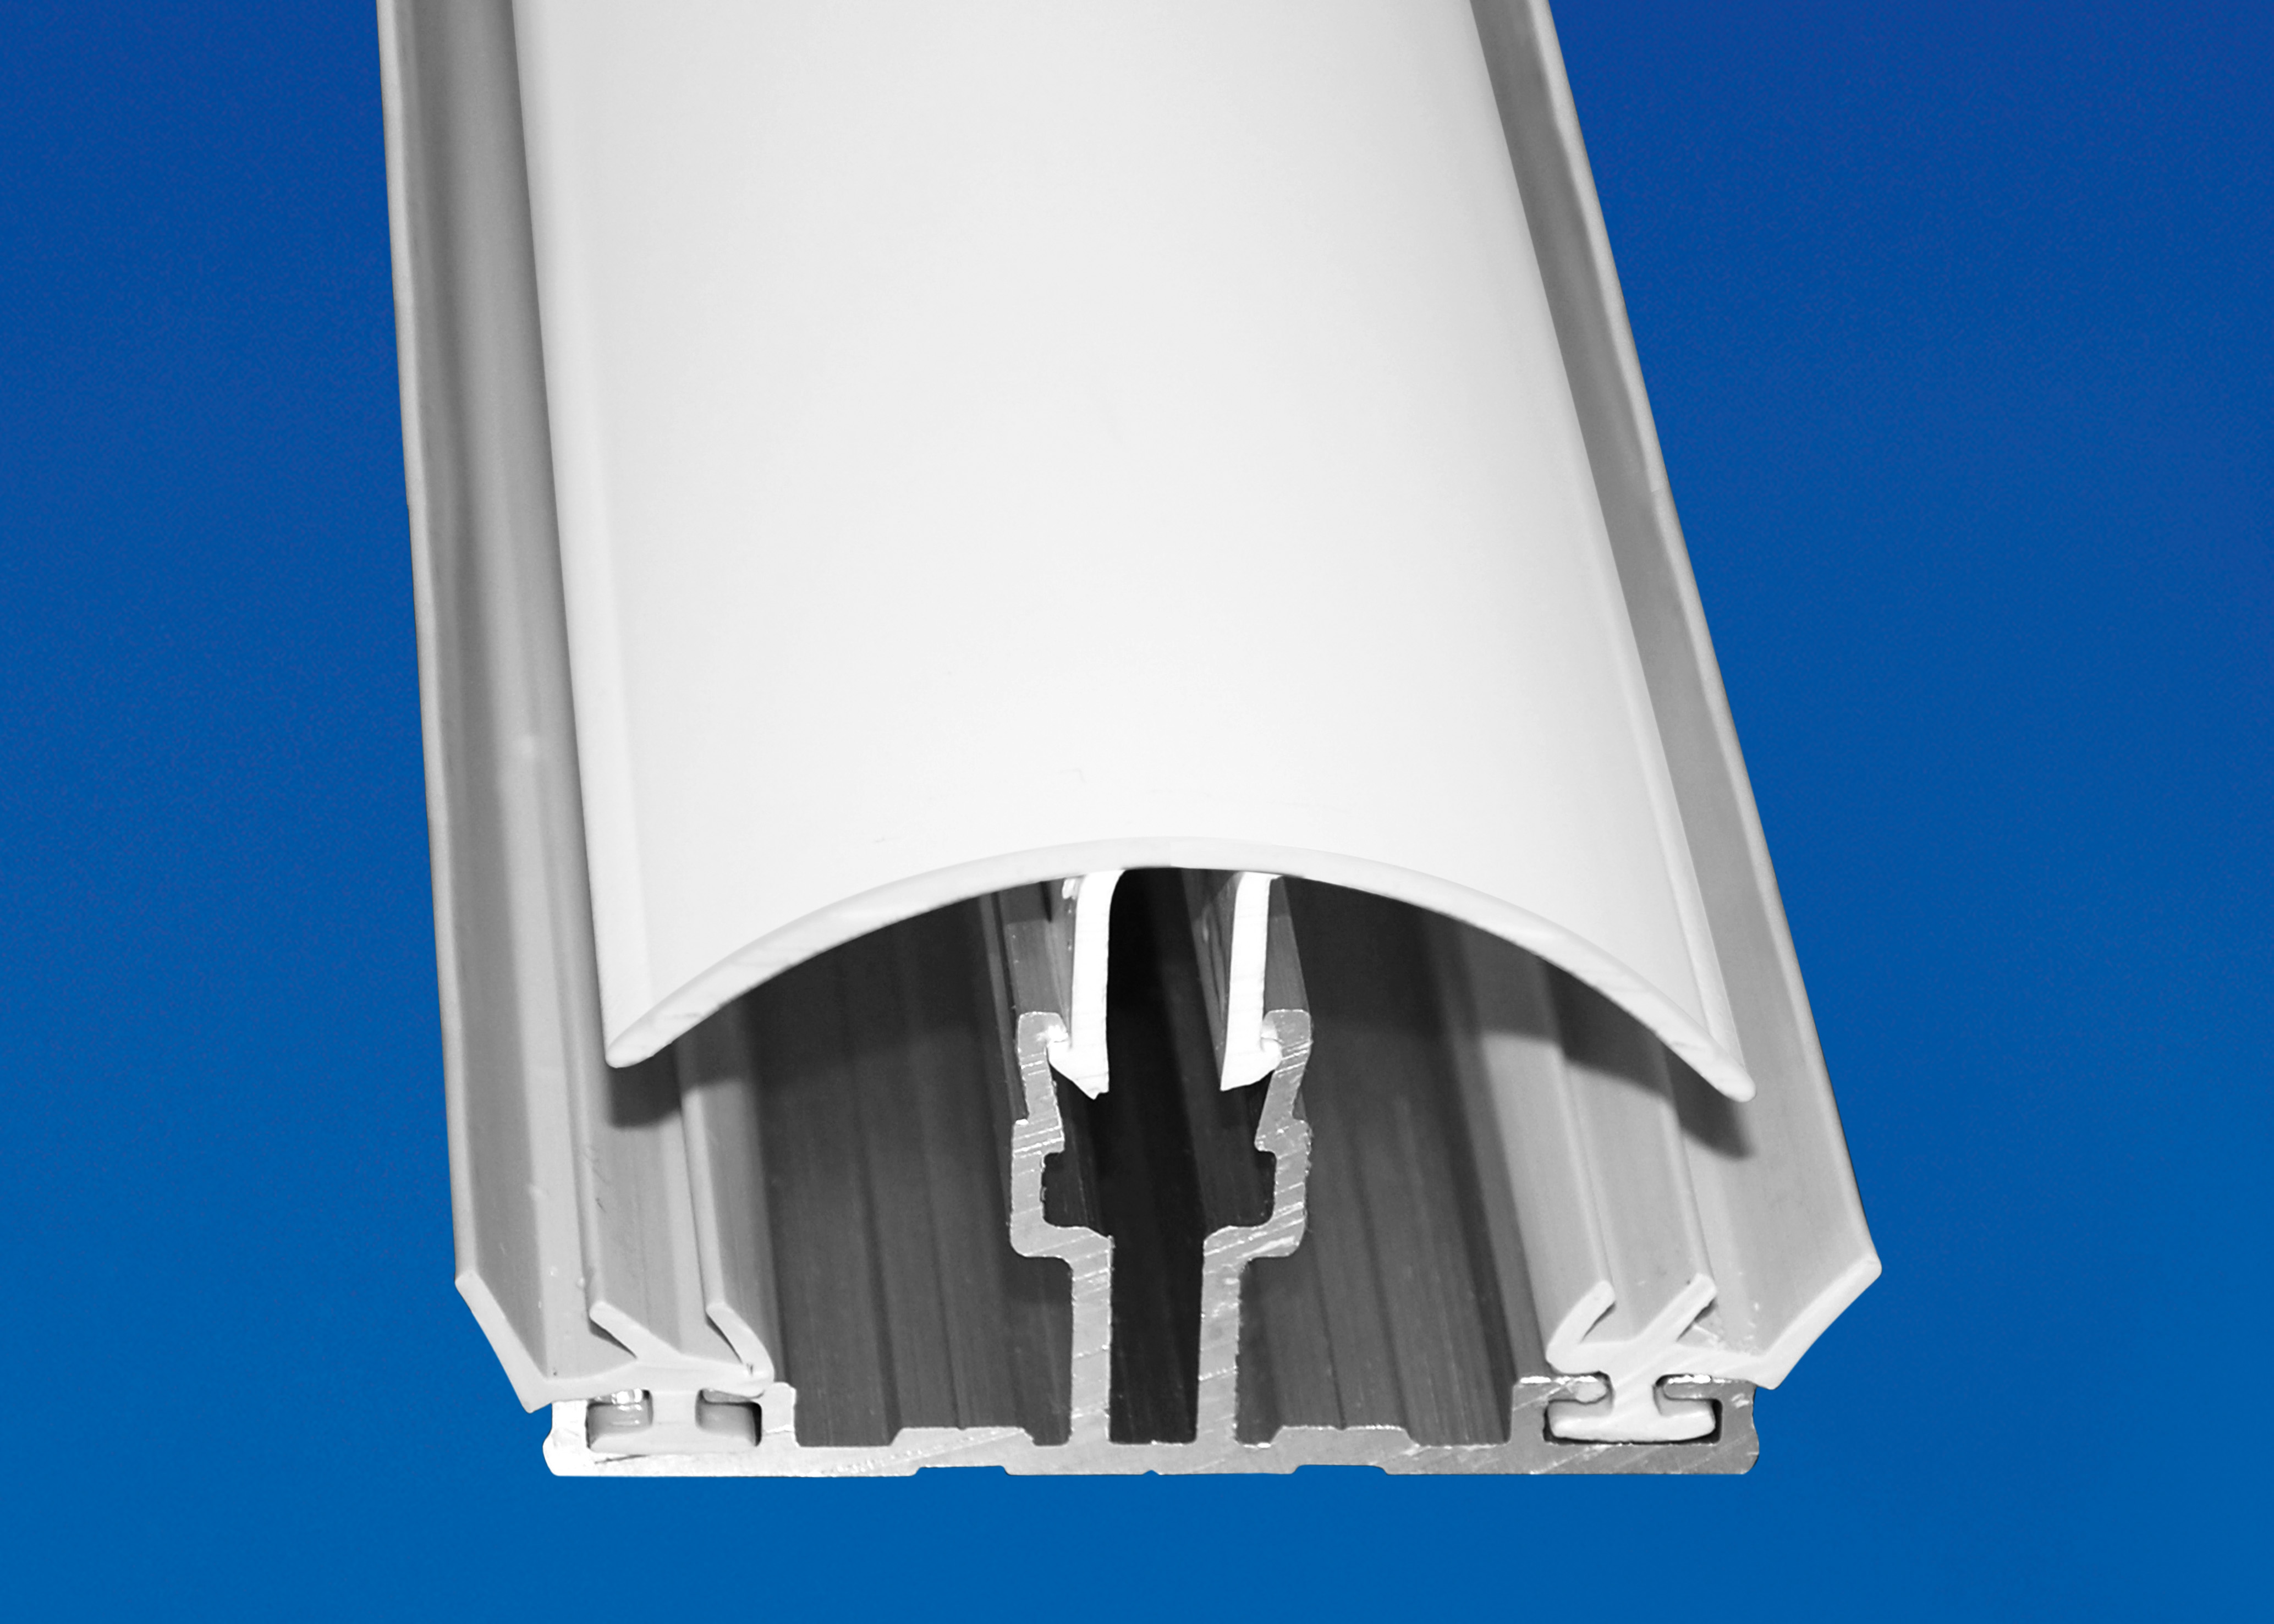 Polycarbonat Stegplatten Hohlkammerplatten X-Struktur klar light 16 mm 2500 x 980 x 16 mm